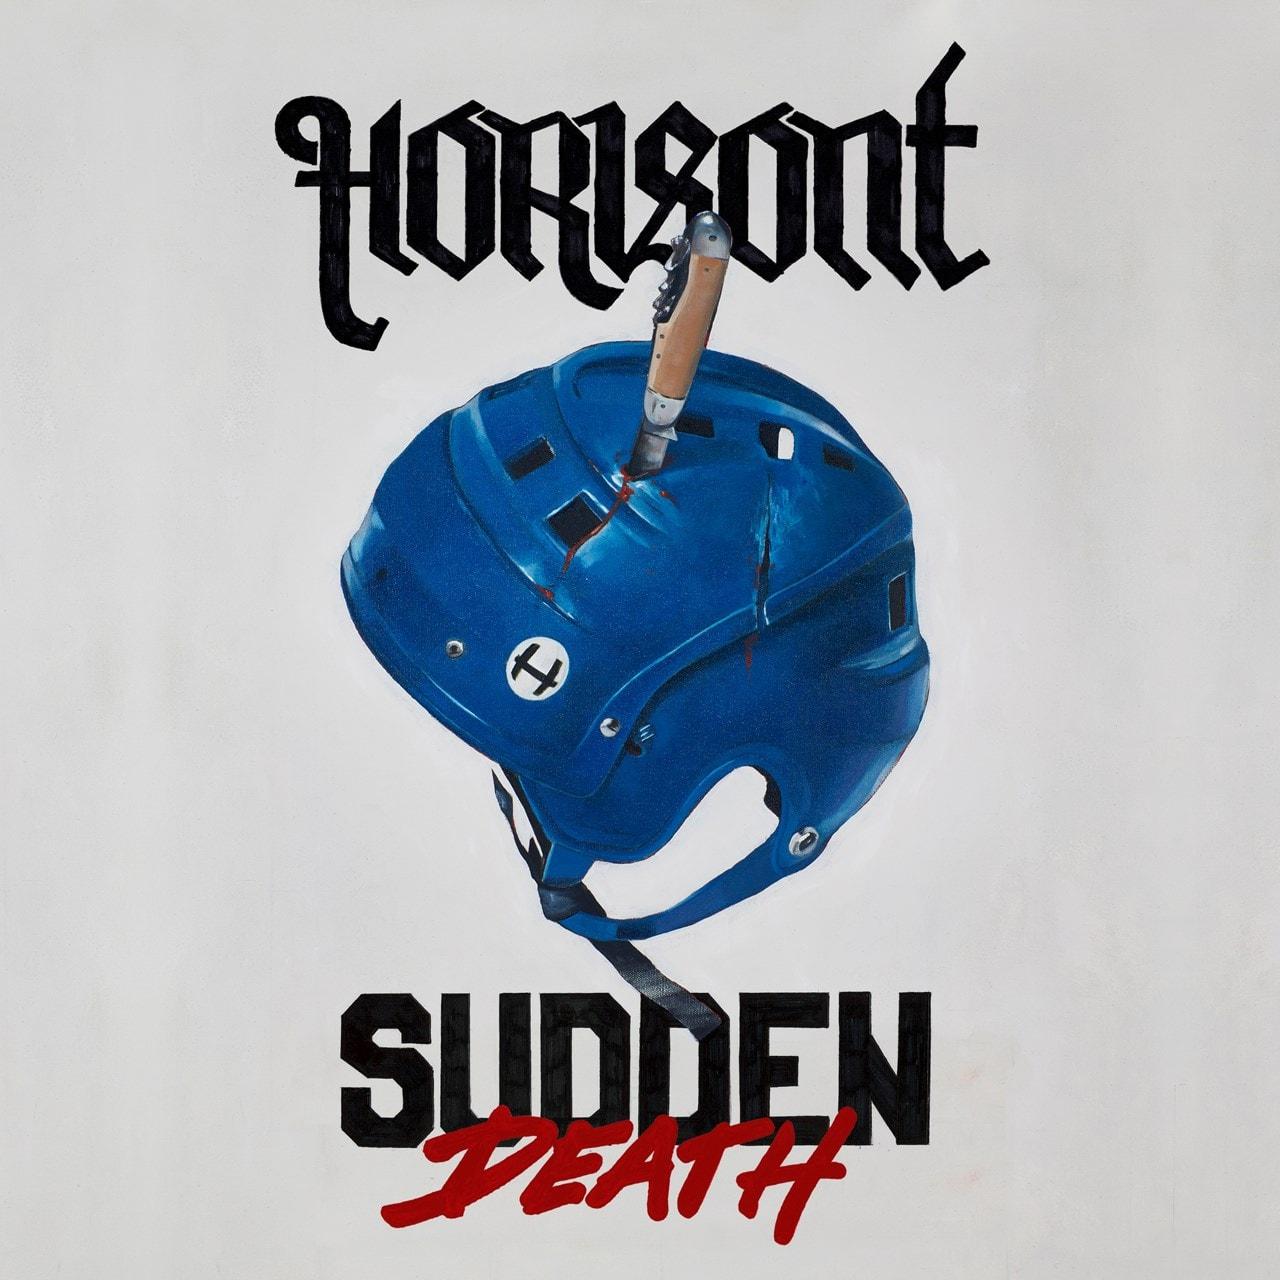 Sudden Death - 1